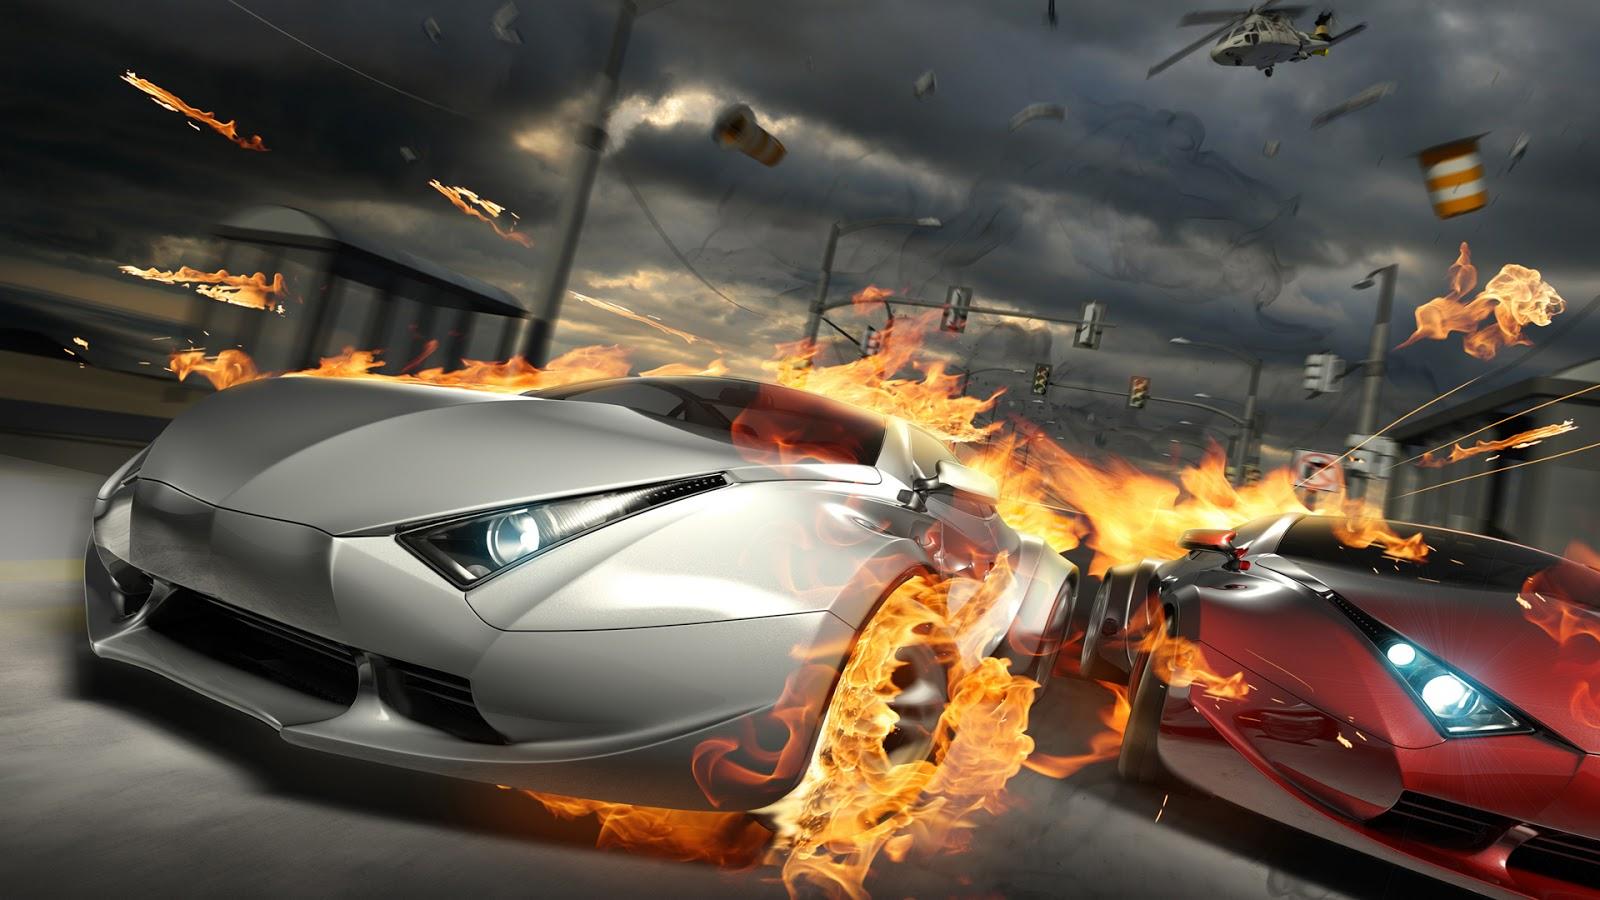 -burning-car-race-hd-1080p-burnout-revenge-car-accident-wallpaper-car ...